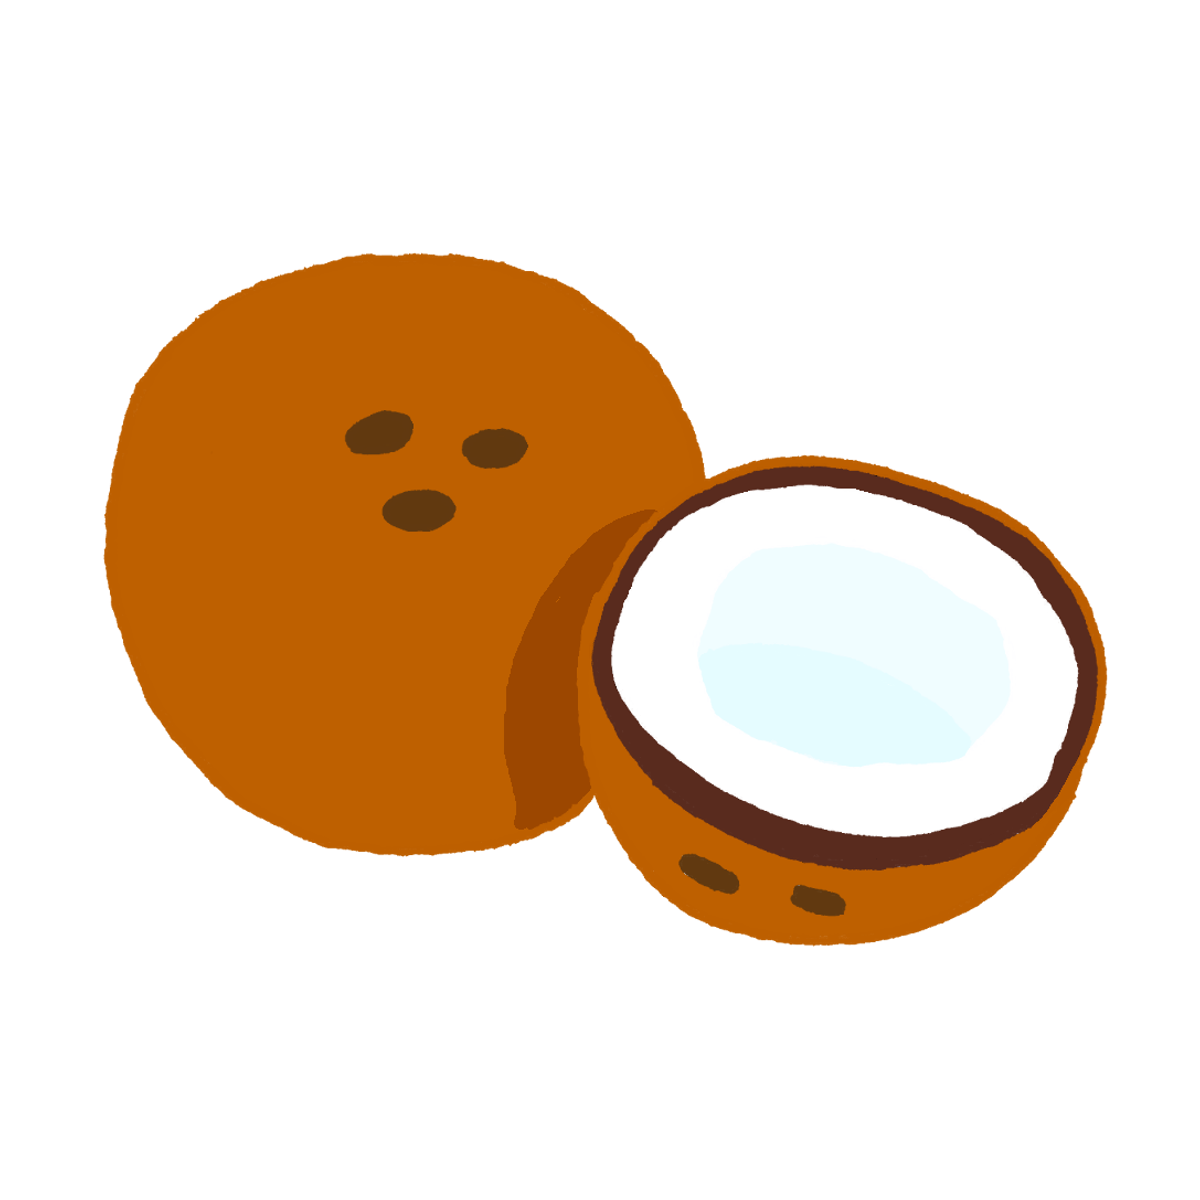 Pin noix de coco dessin on pinterest - Dessin noix de coco ...